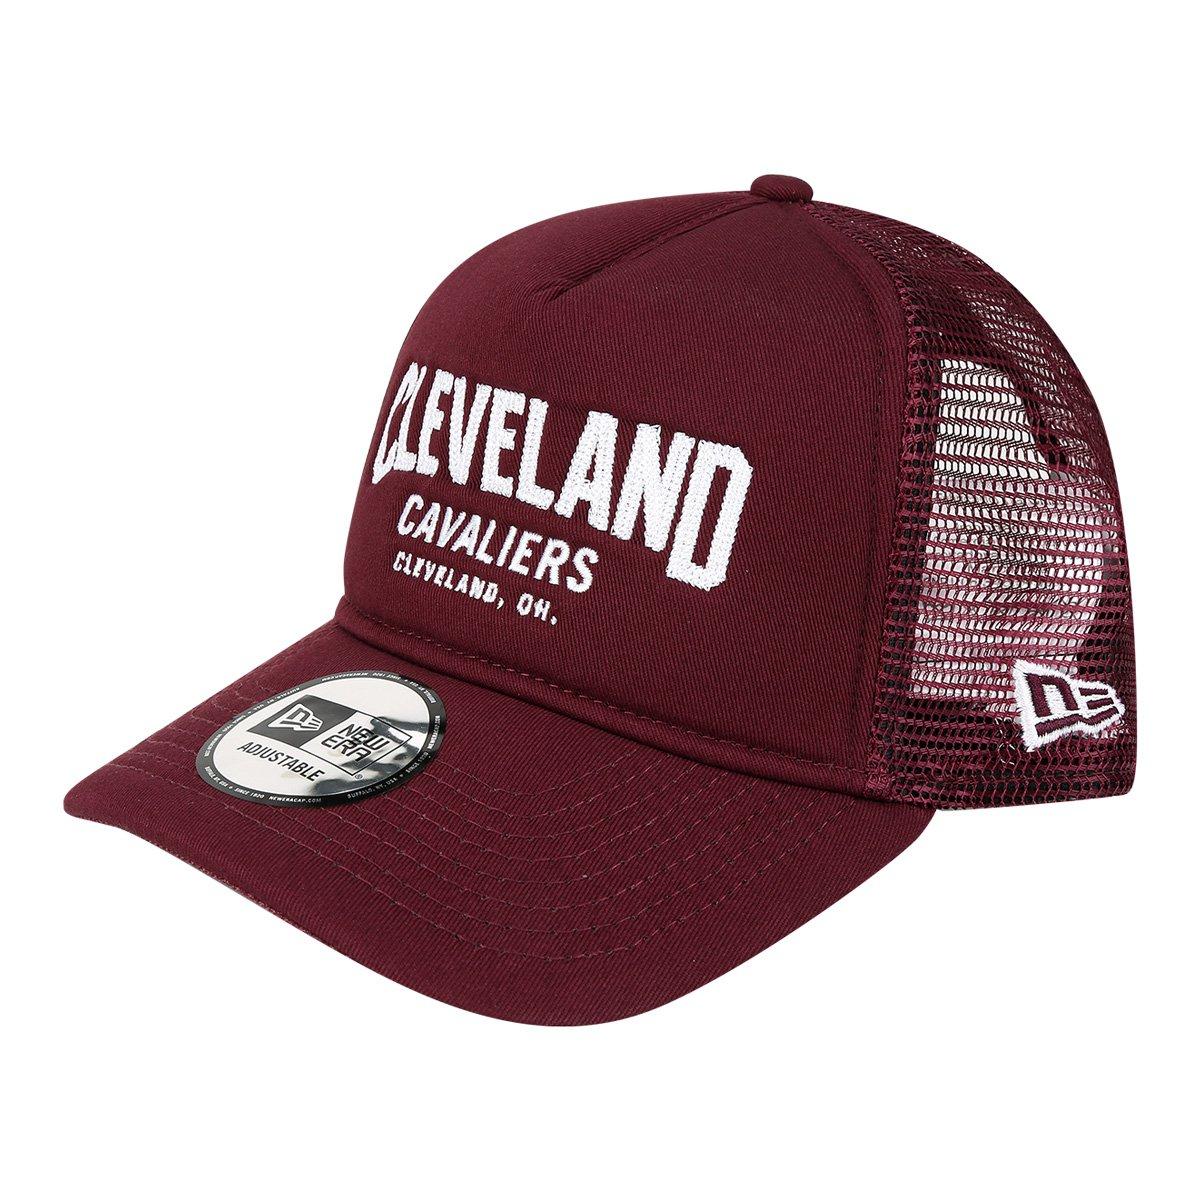 Boné New Era NBA Cleveland Cavaliers Aba Curva 940 Af SN Lic2146 Fa17 Mrnwh  - Compre Agora  0d869f983e7